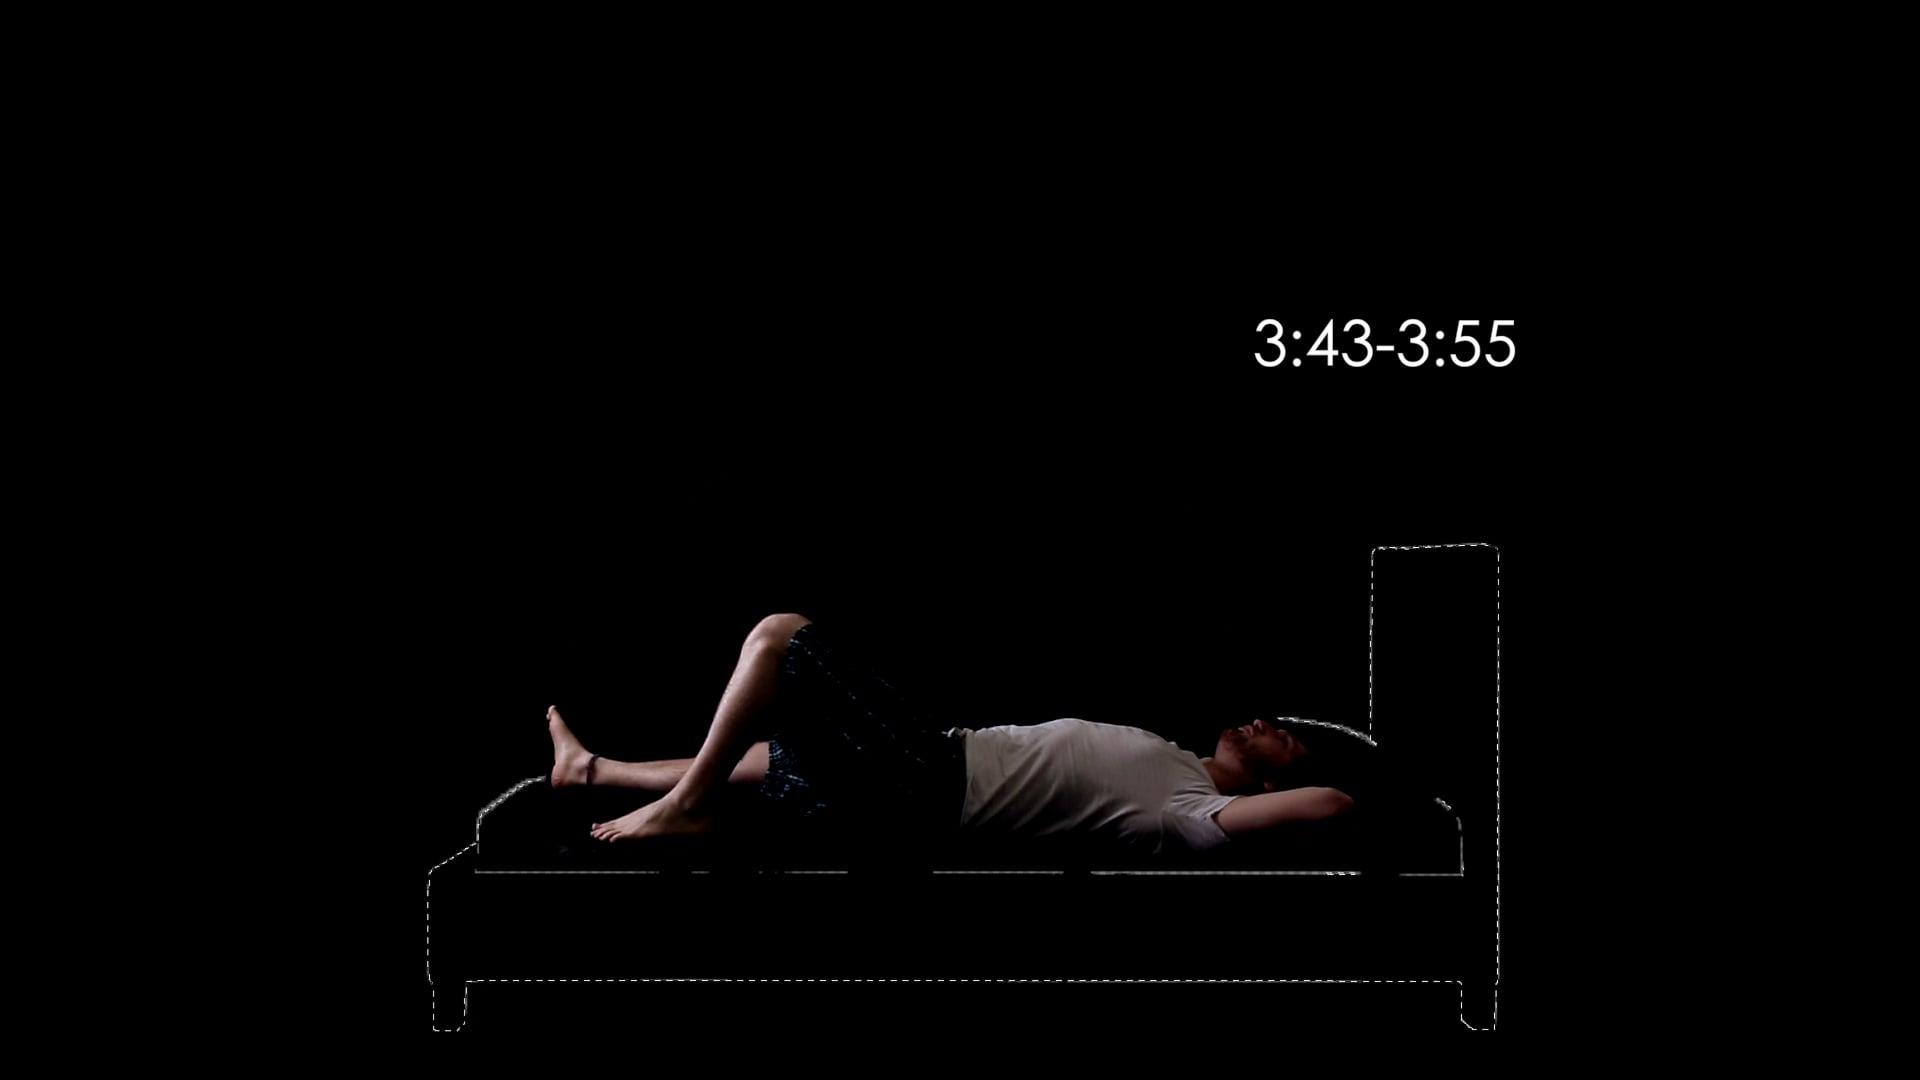 3:43-3:55